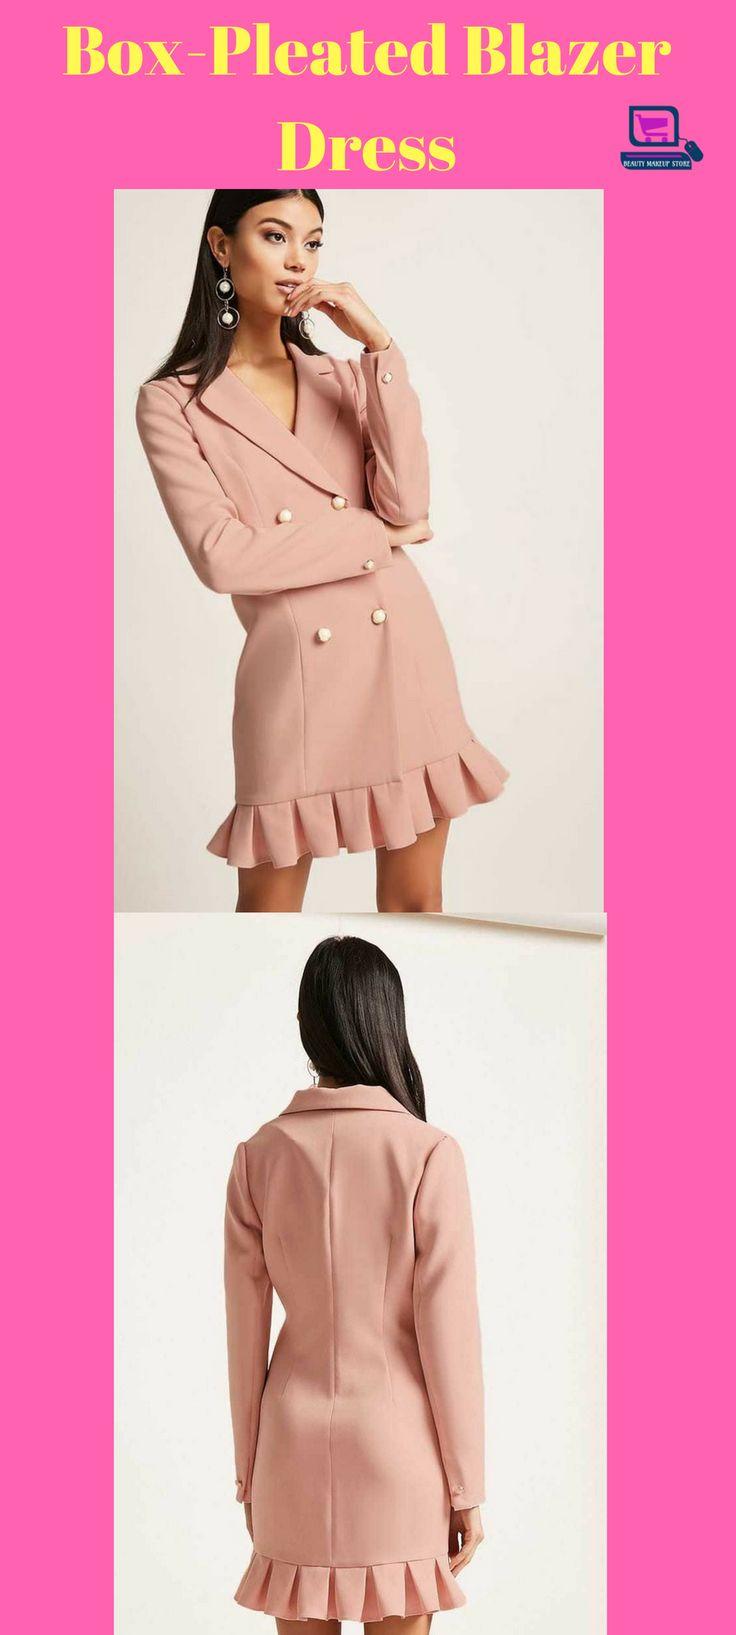 Box-Pleated Blazer Dress #dress #pleateddress #dresses #clothing #womenclothing #fashion #fashionjewelry